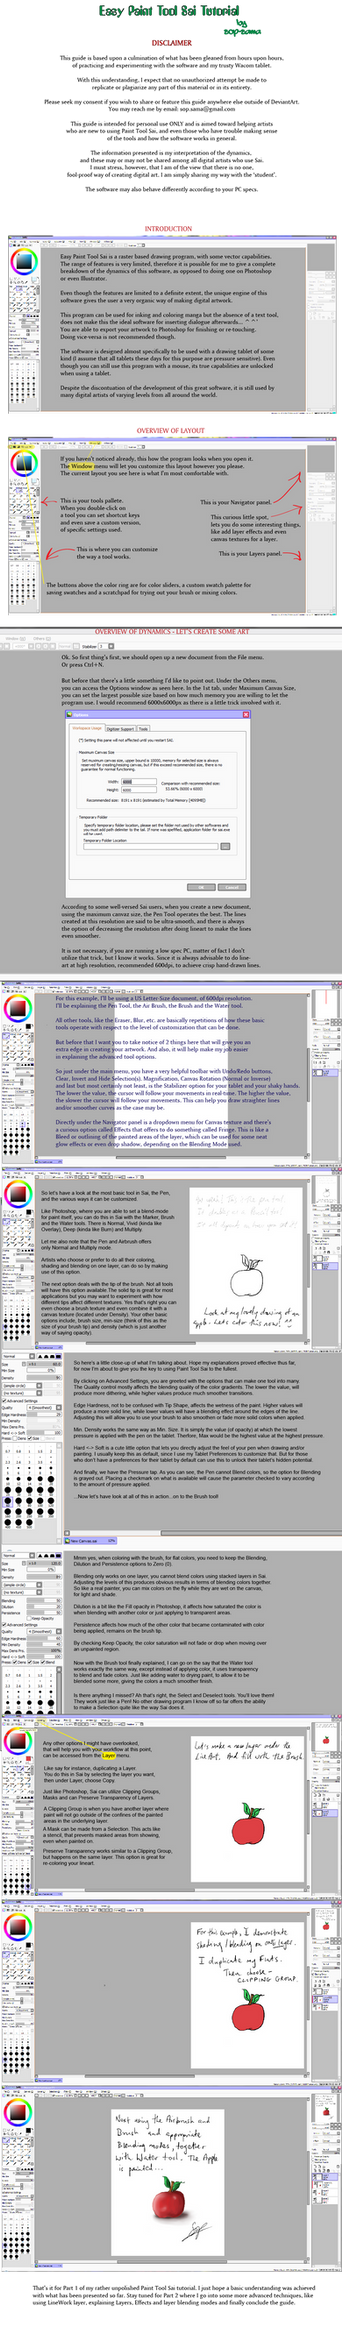 Easy Paint Sai Tutorial - Part 1 :Draft: